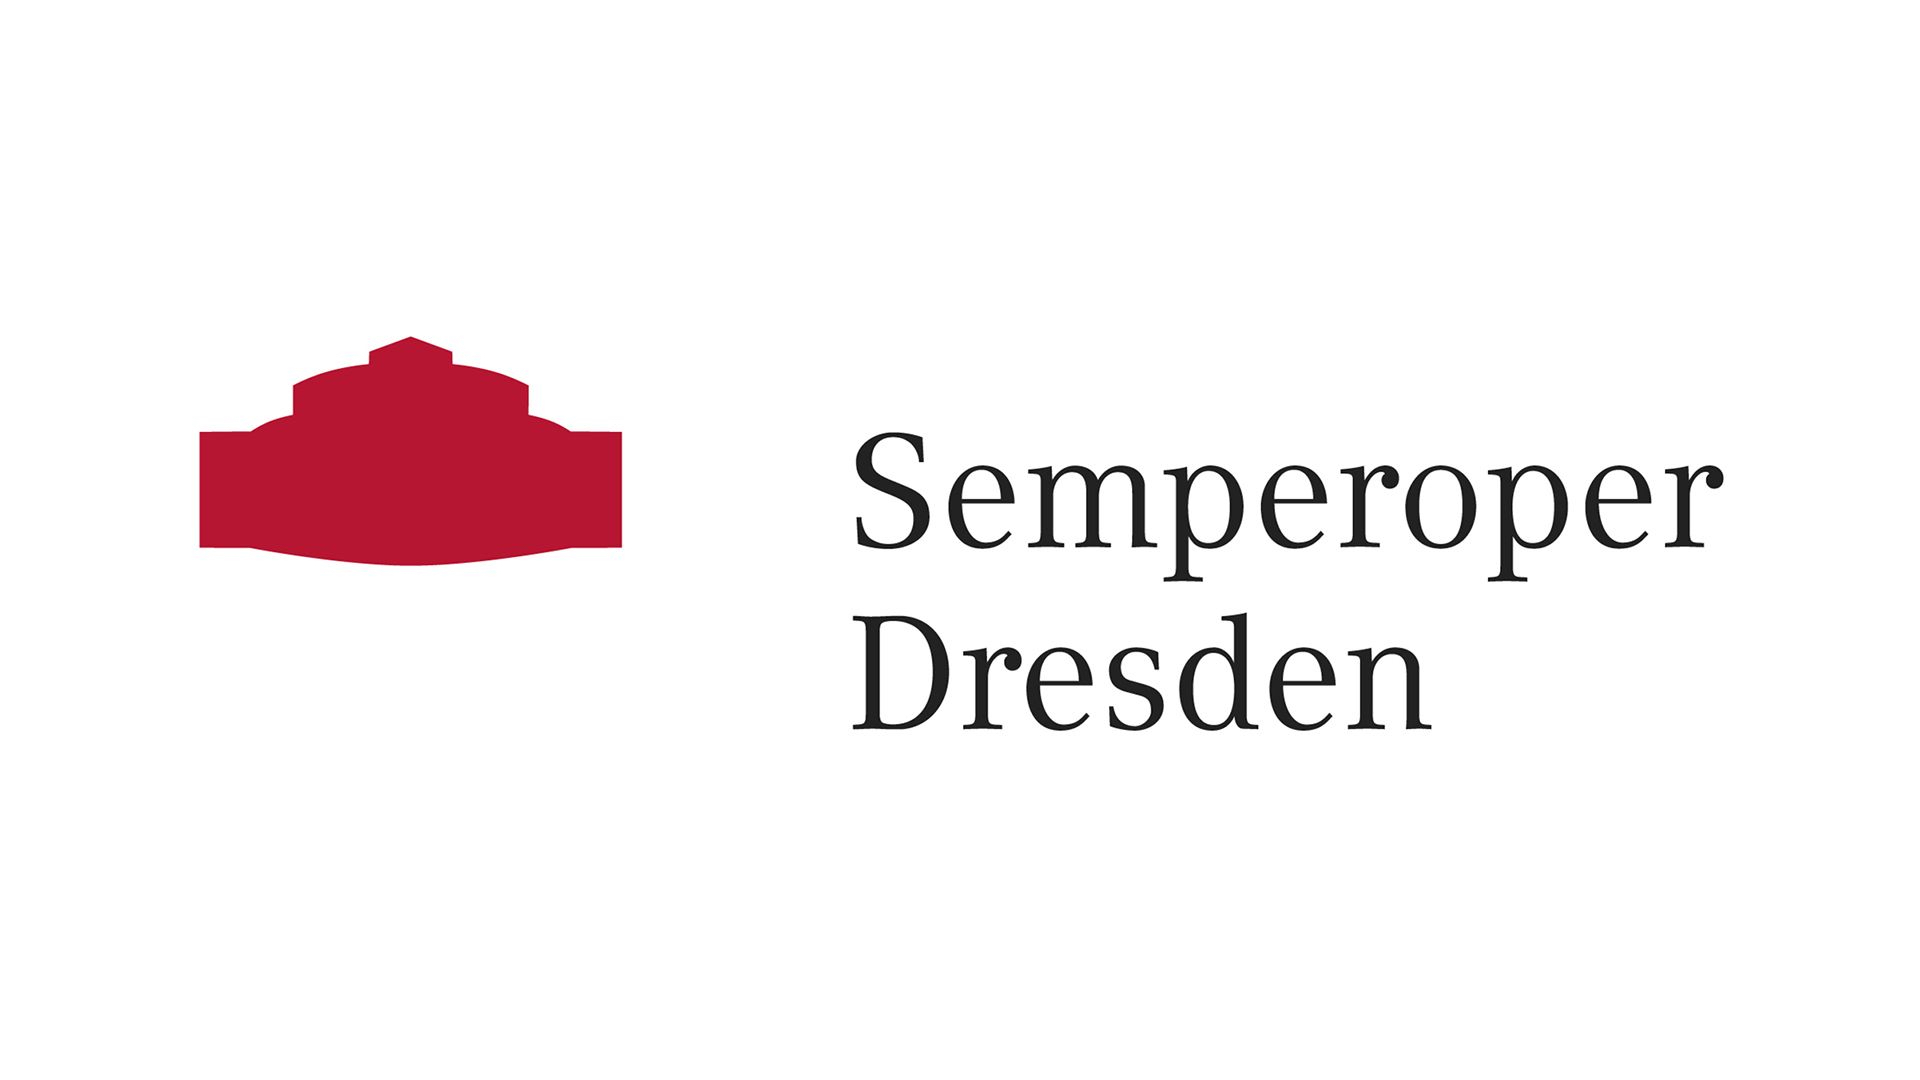 Semperoper Dresden, Anna Netrebko; Opera; Dresda